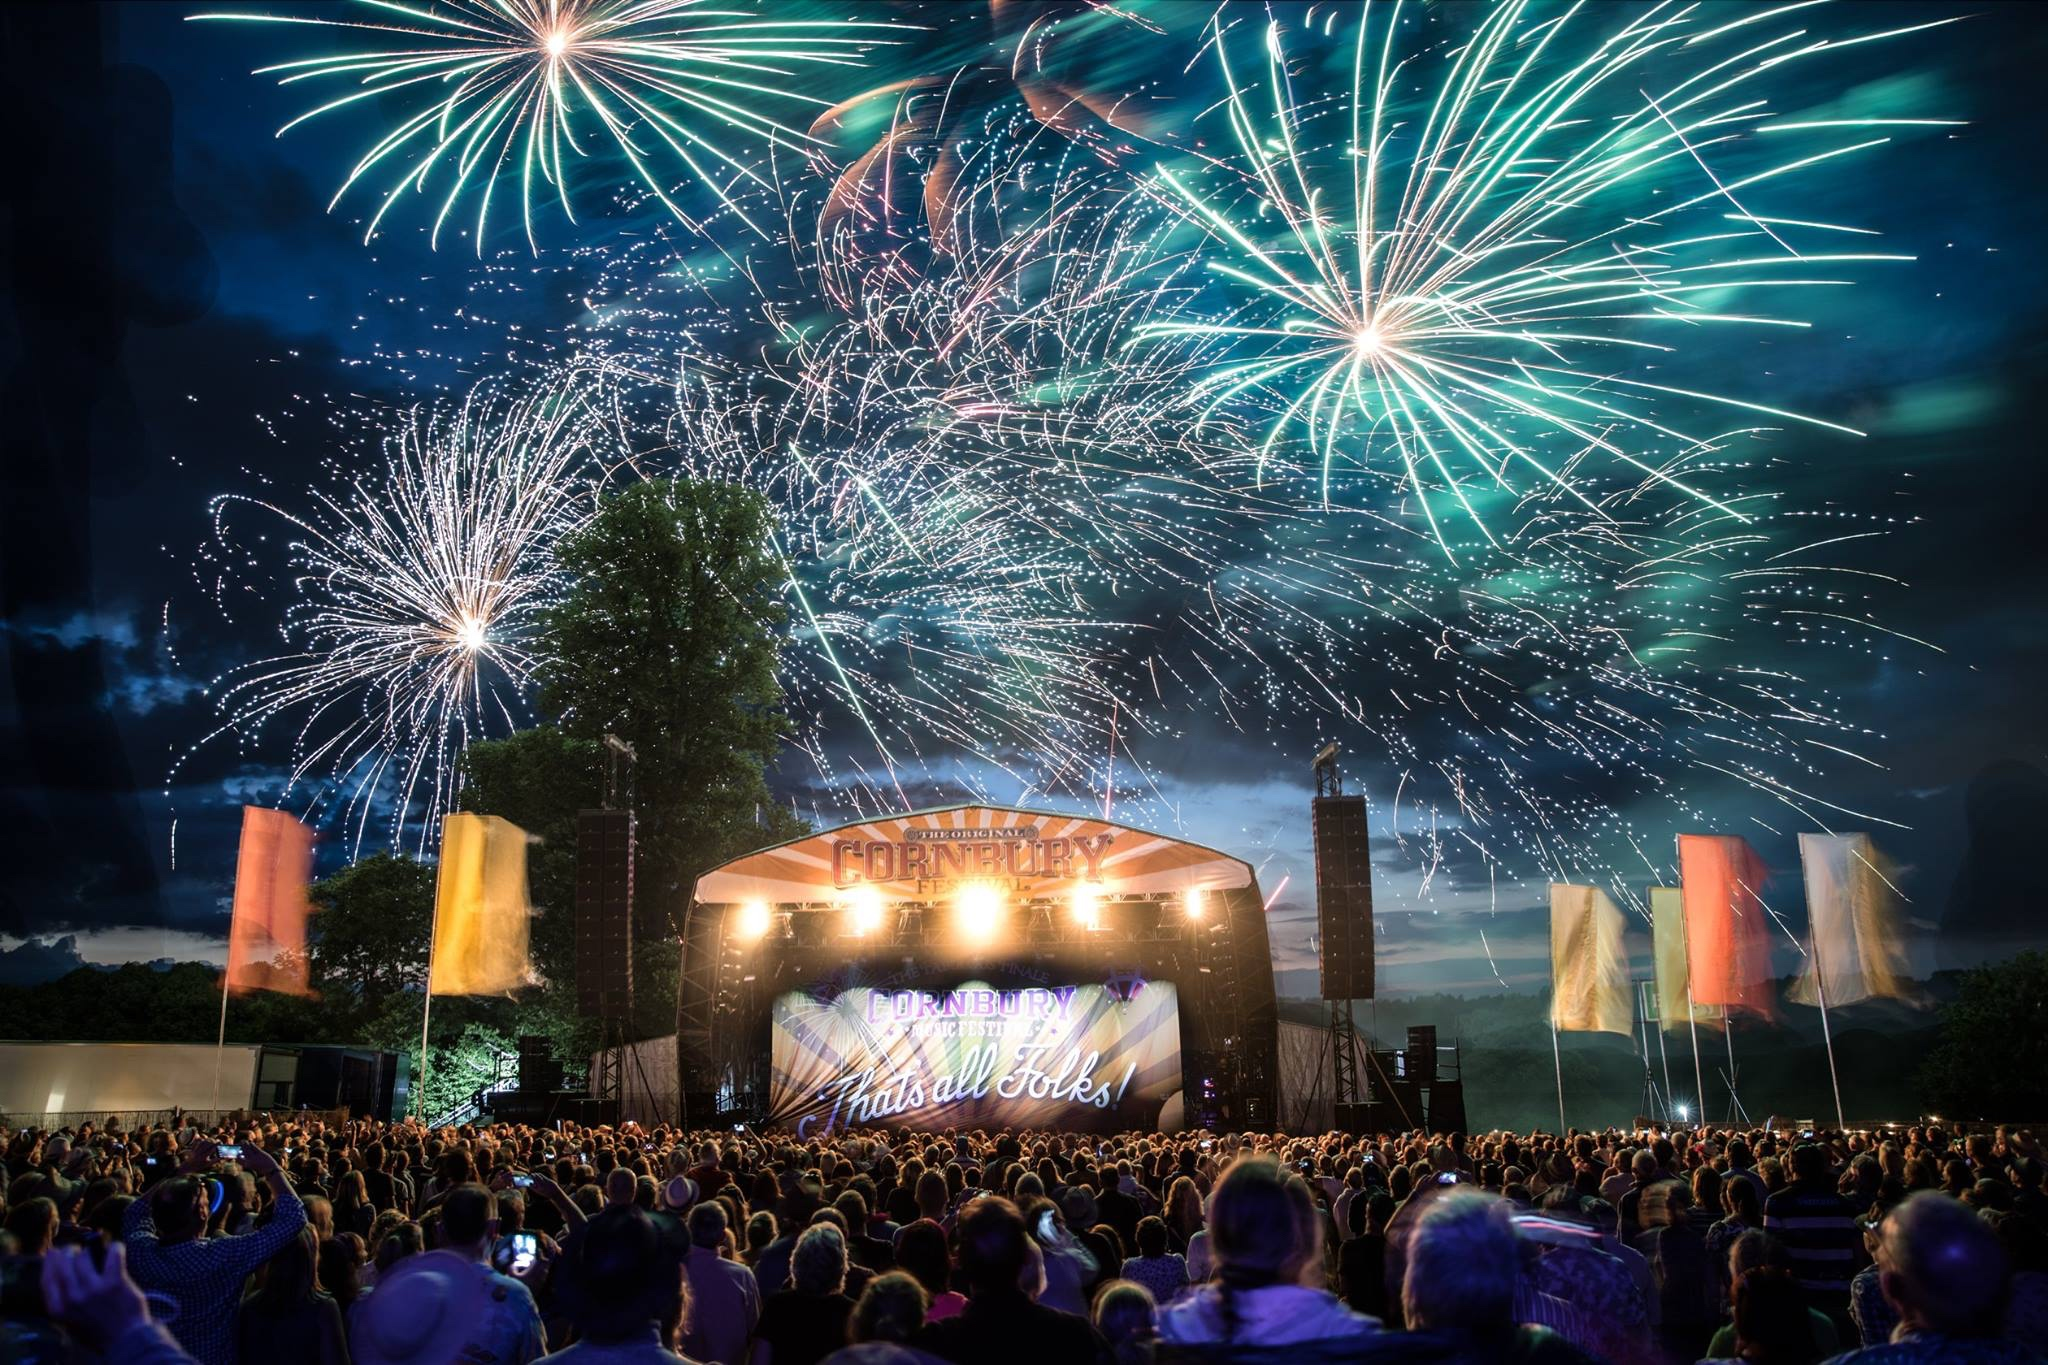 Cornbury festival 2017